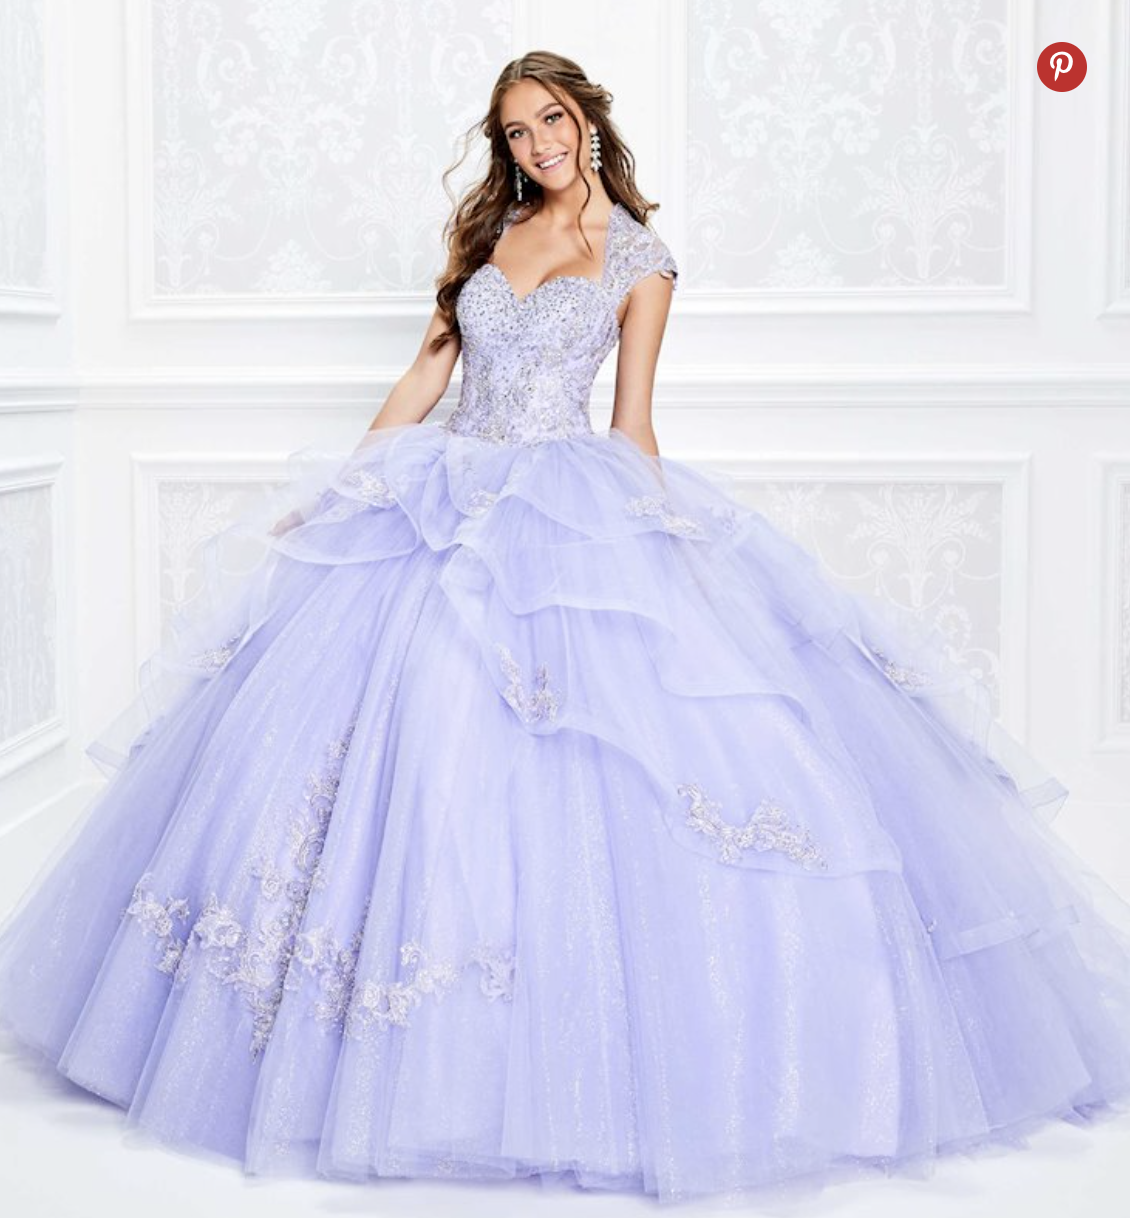 Princesa By Ariana Vara PR11923